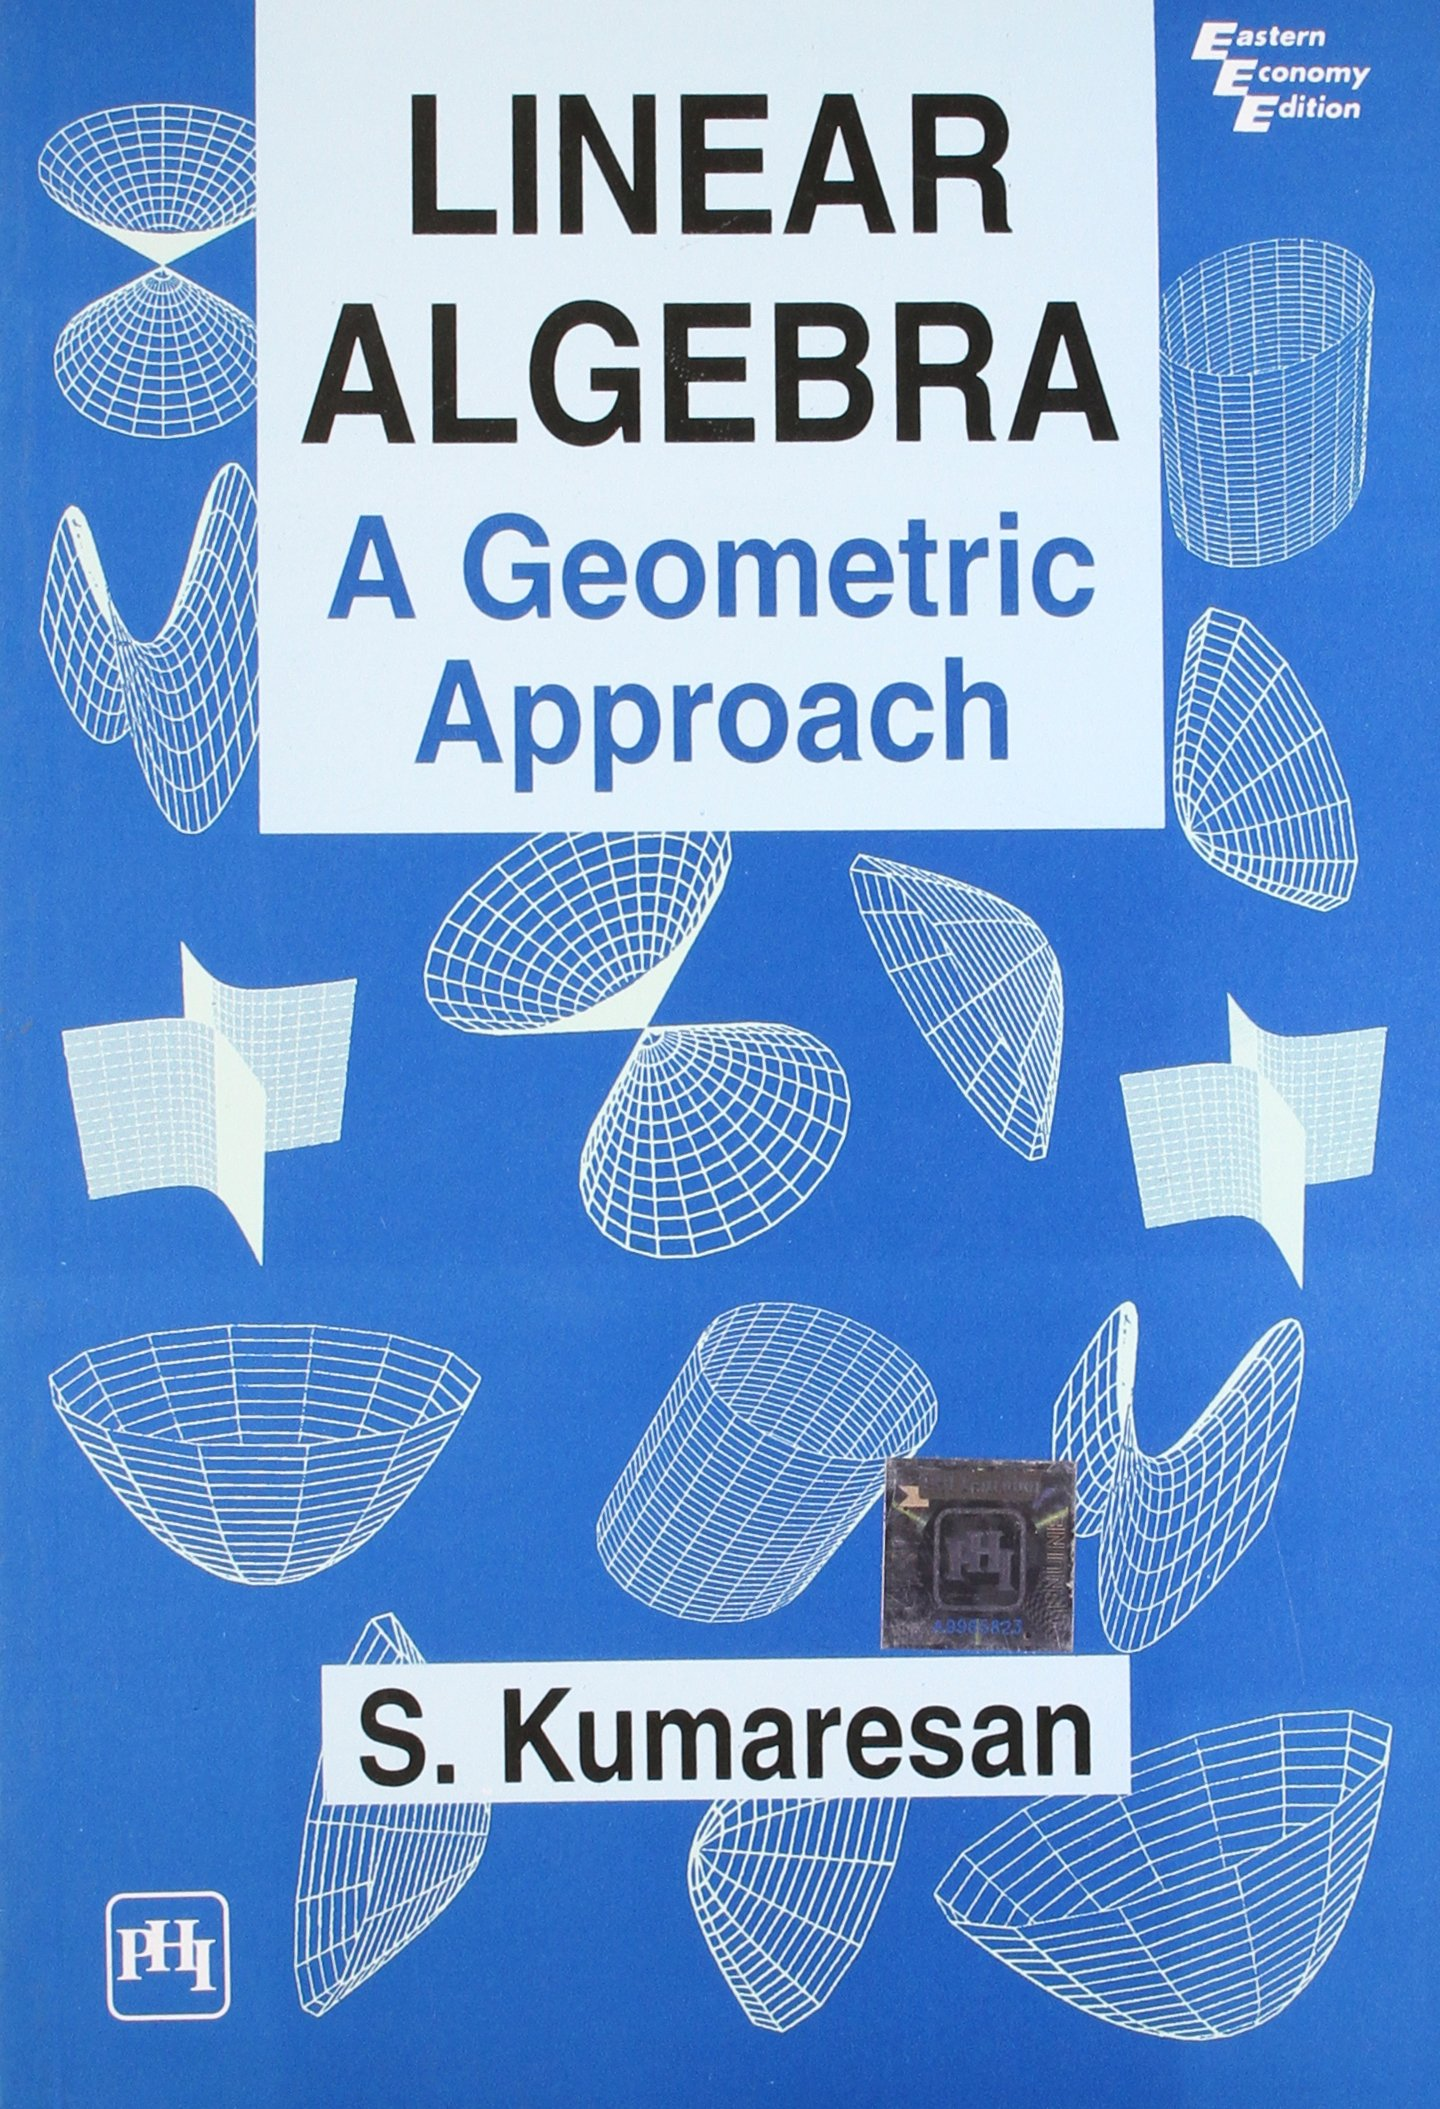 Linear Algebra: A Geometric Approach: S  Kumaresan: 9788120316287